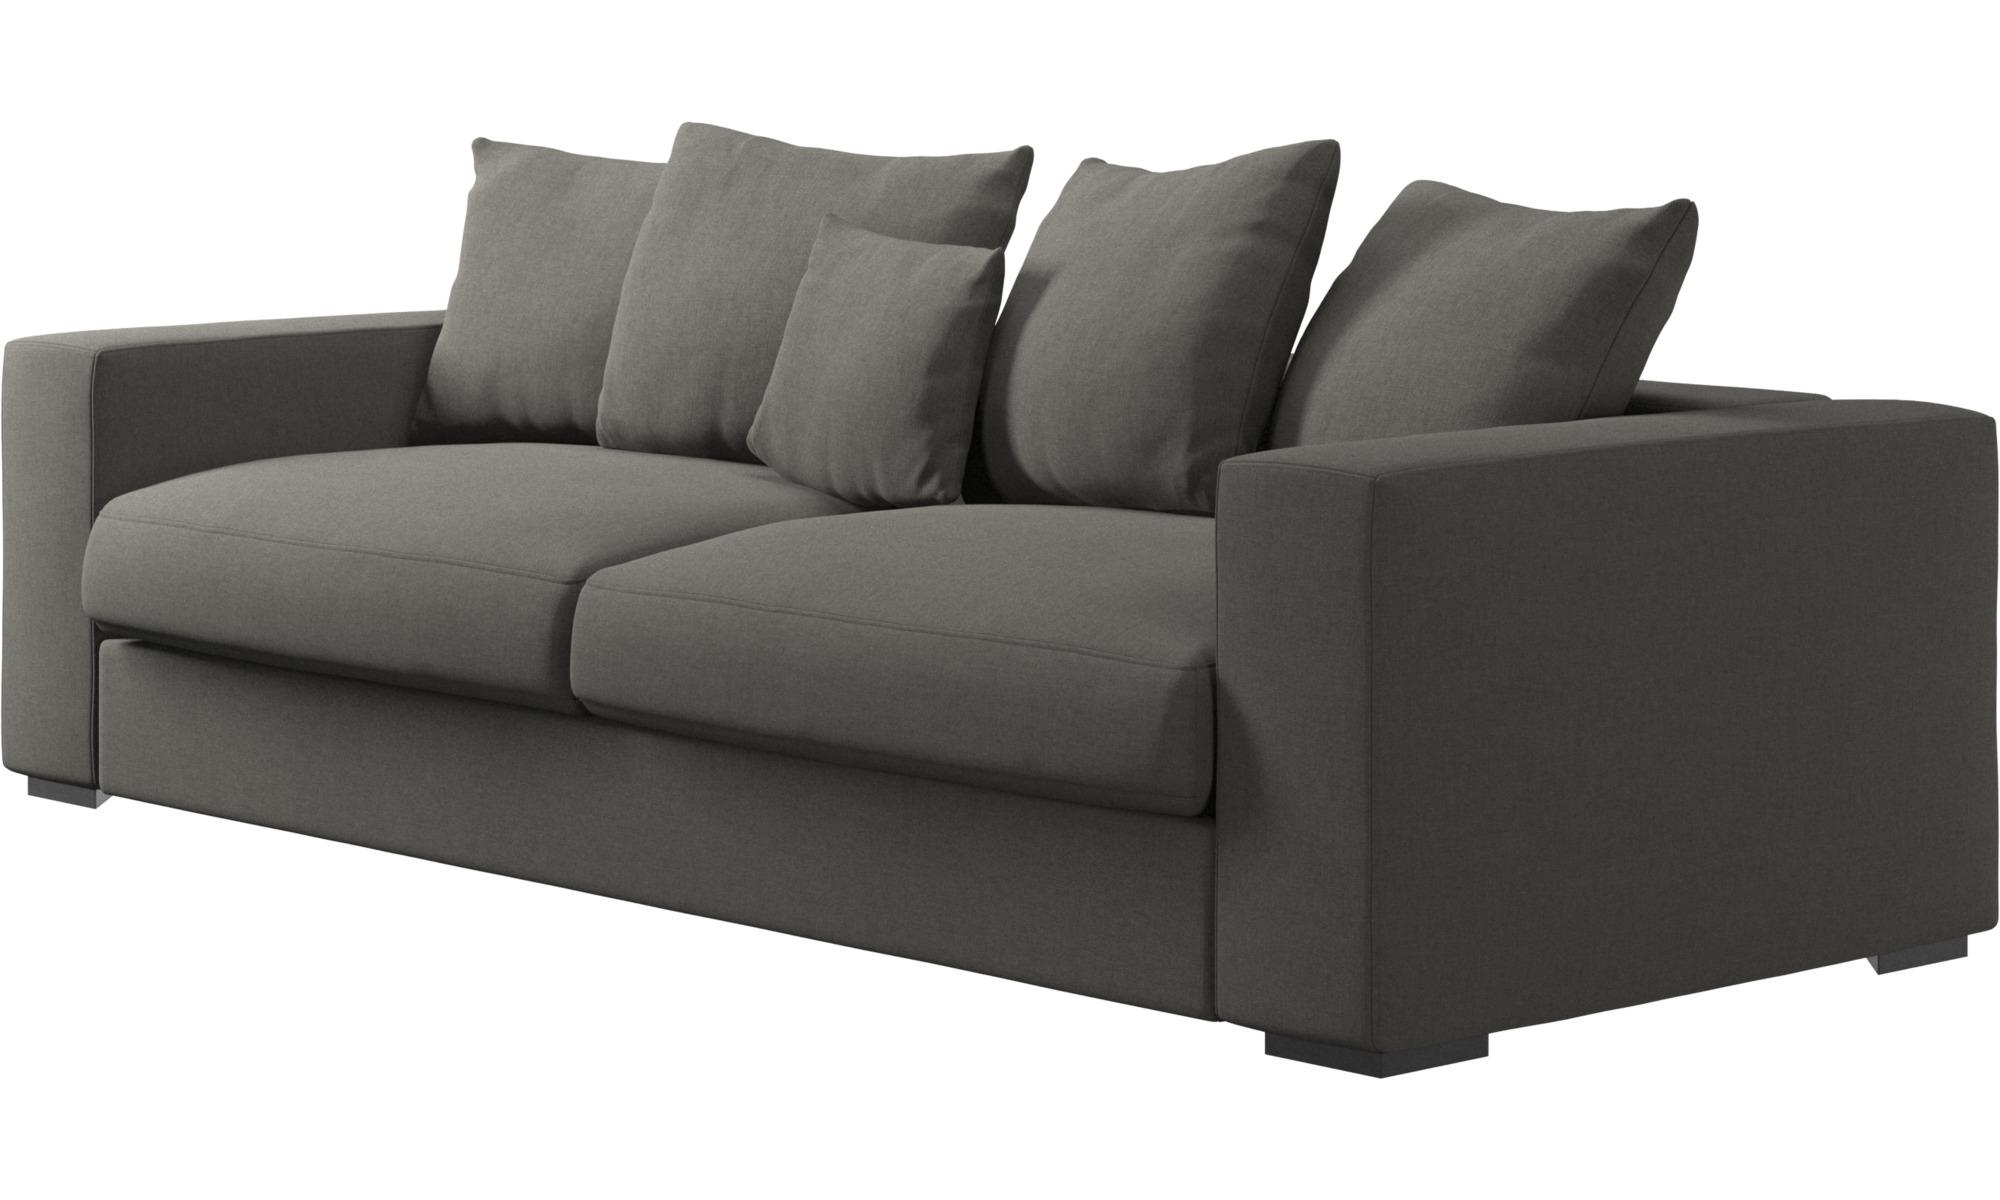 ... 3 Seater Sofas   Cenova Sofa   Gray   Fabric ...